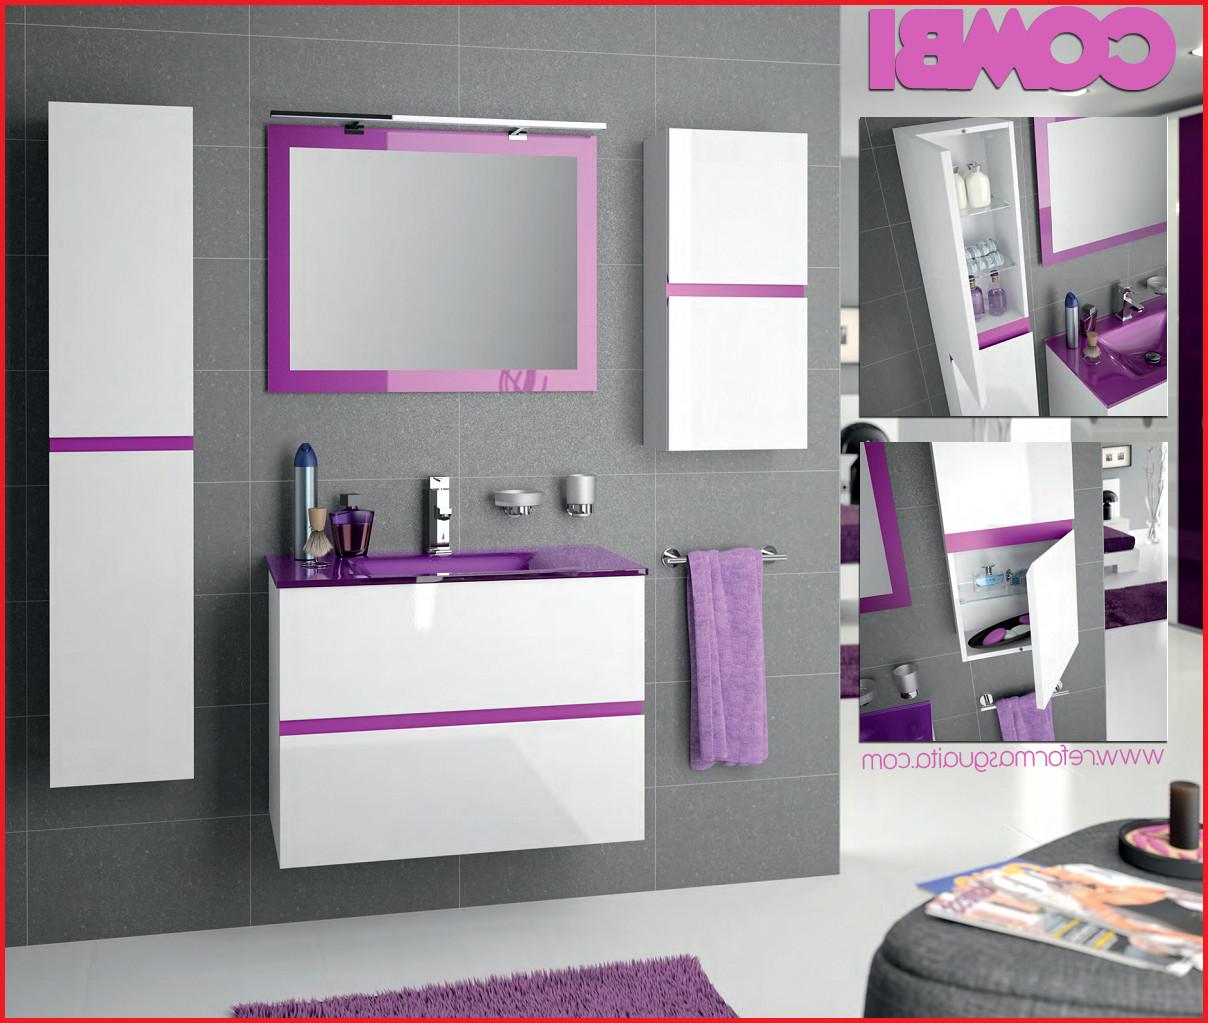 Muebles De Baño Blanco Wddj Muebles De Baà O En Blanco Muebles Color Uva Obtenga Ideas